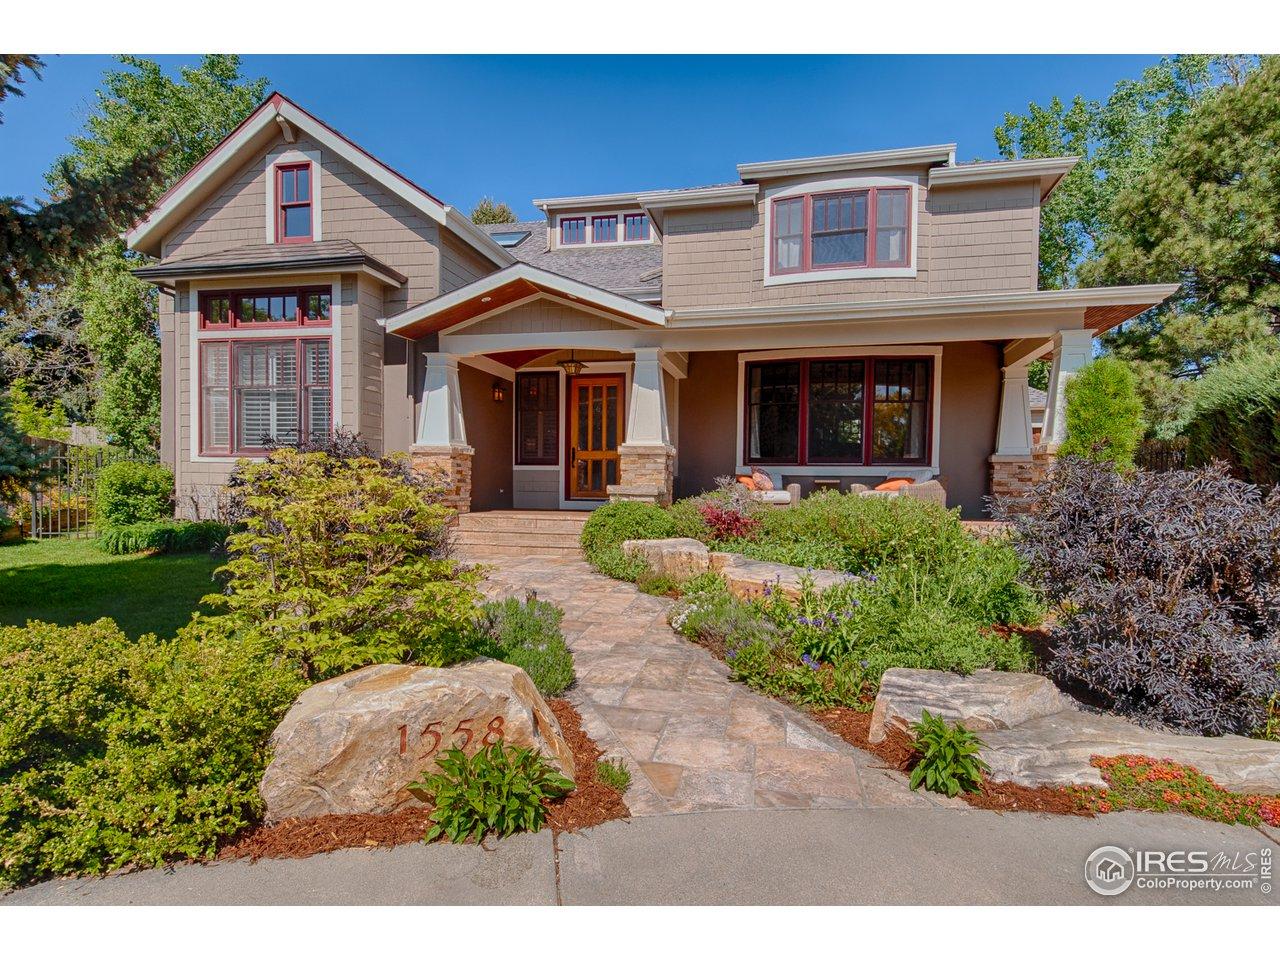 1558 Cress Ct, Boulder CO 80304